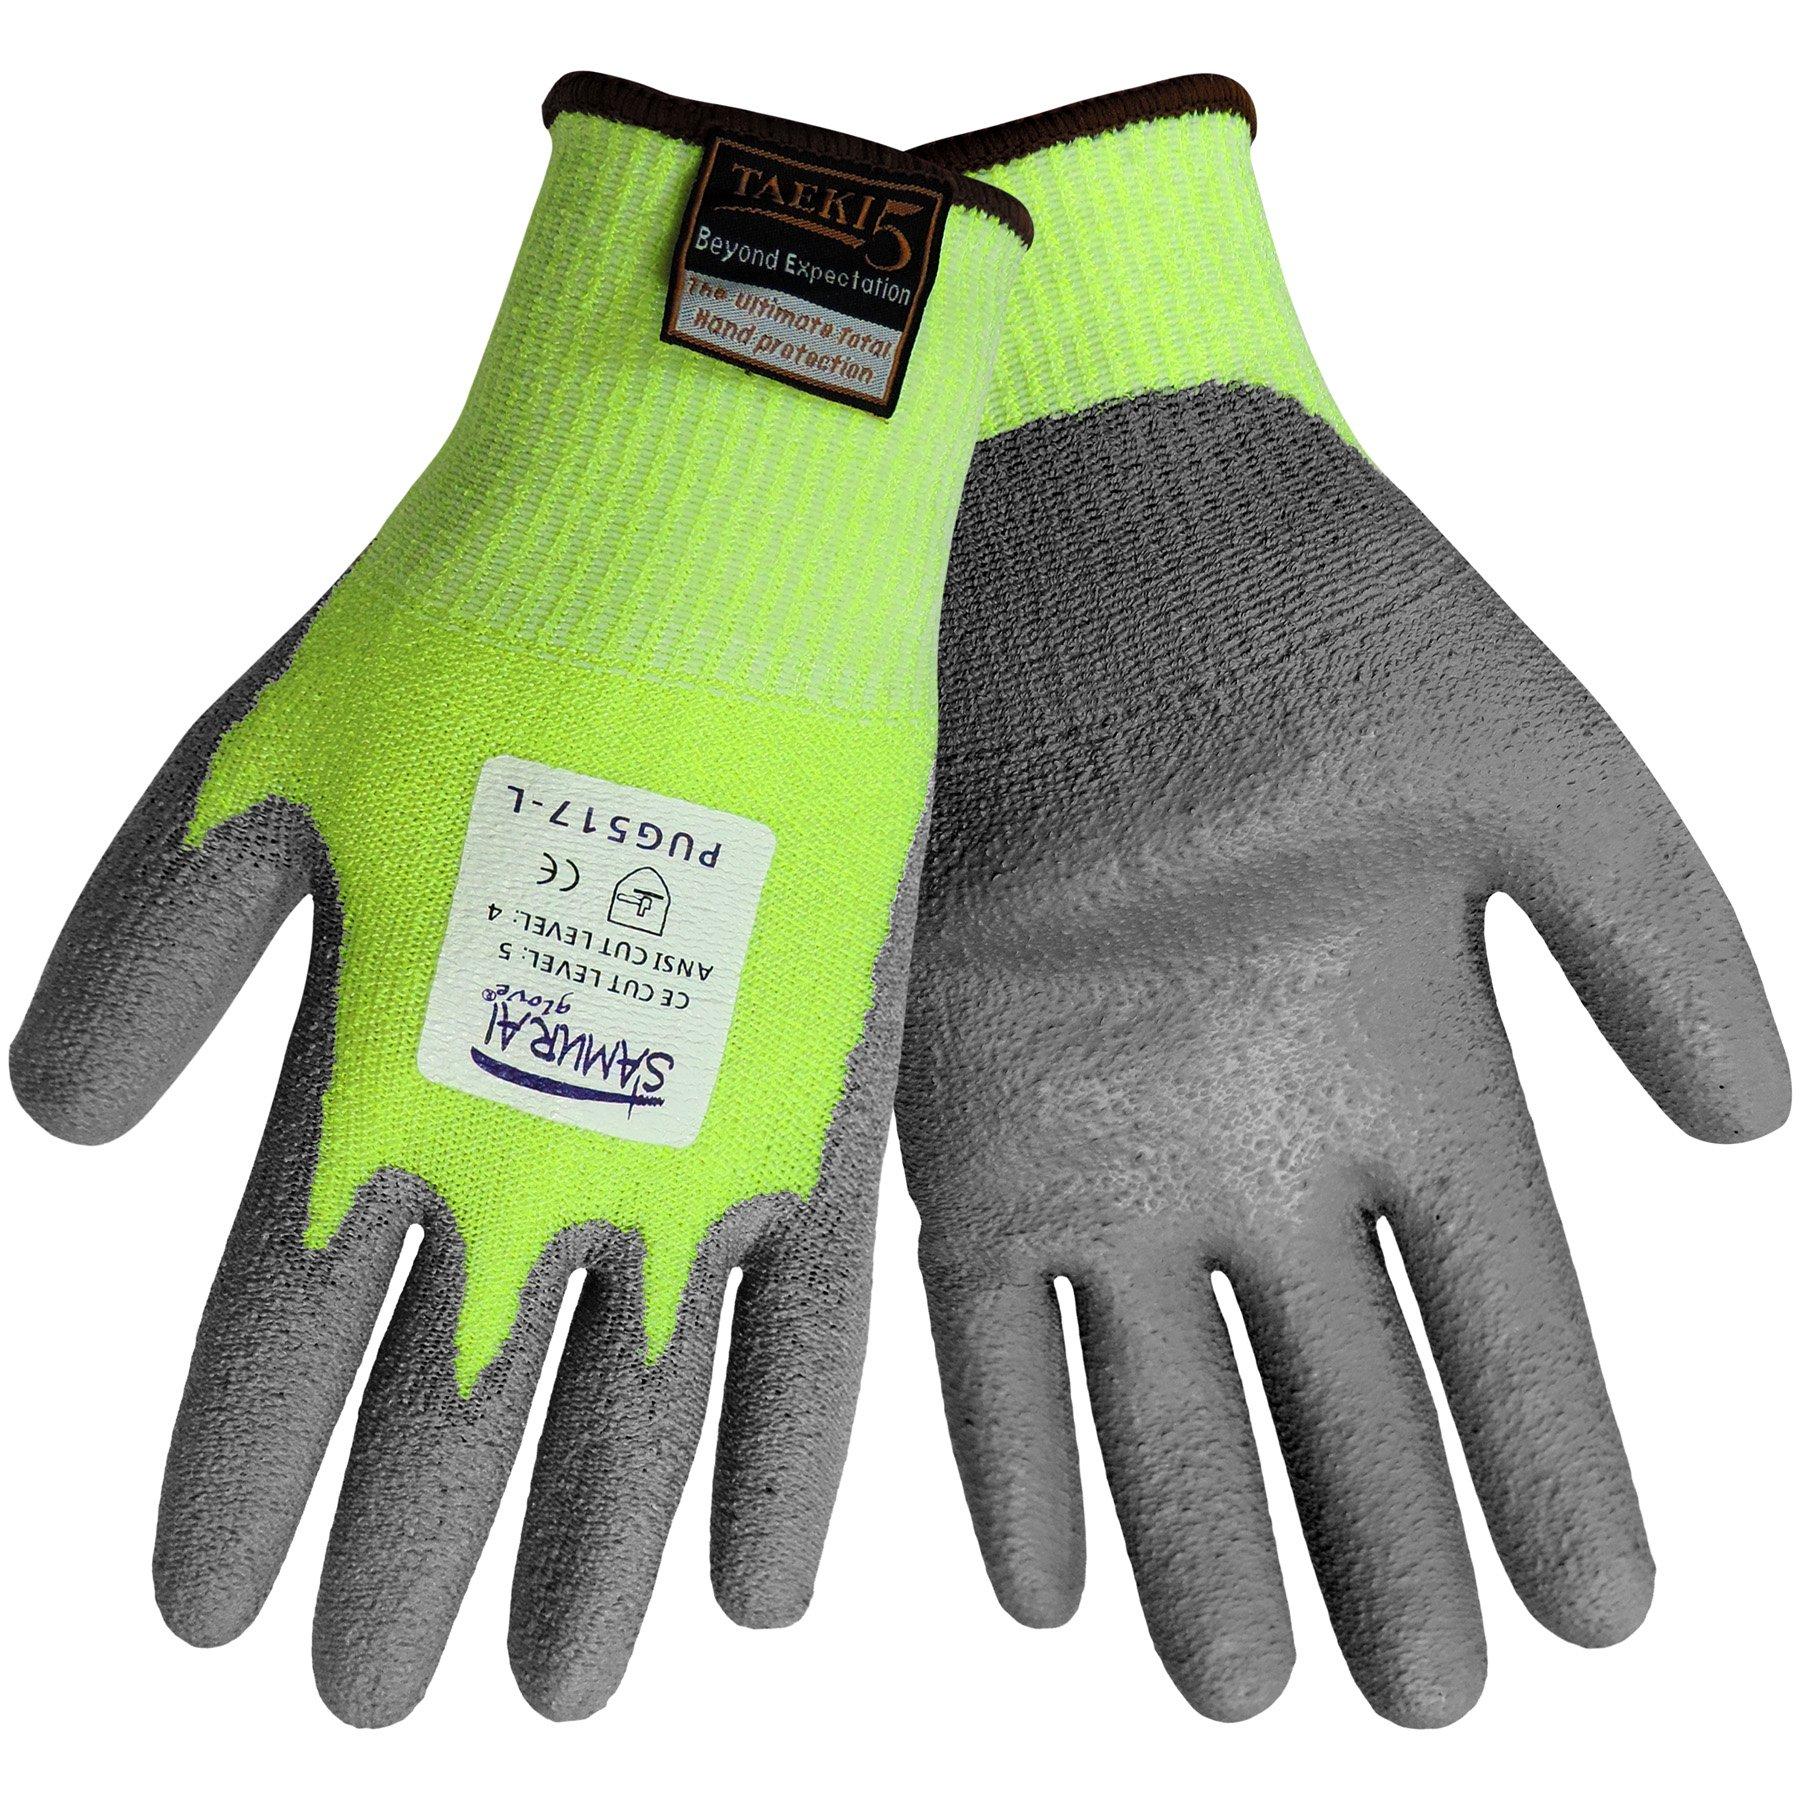 Global Glove PUG517 Samurai Taeki5 Polyurethane Glove, Cut Resistant, Large, Grey (Case of 72) by Global Glove (Image #1)